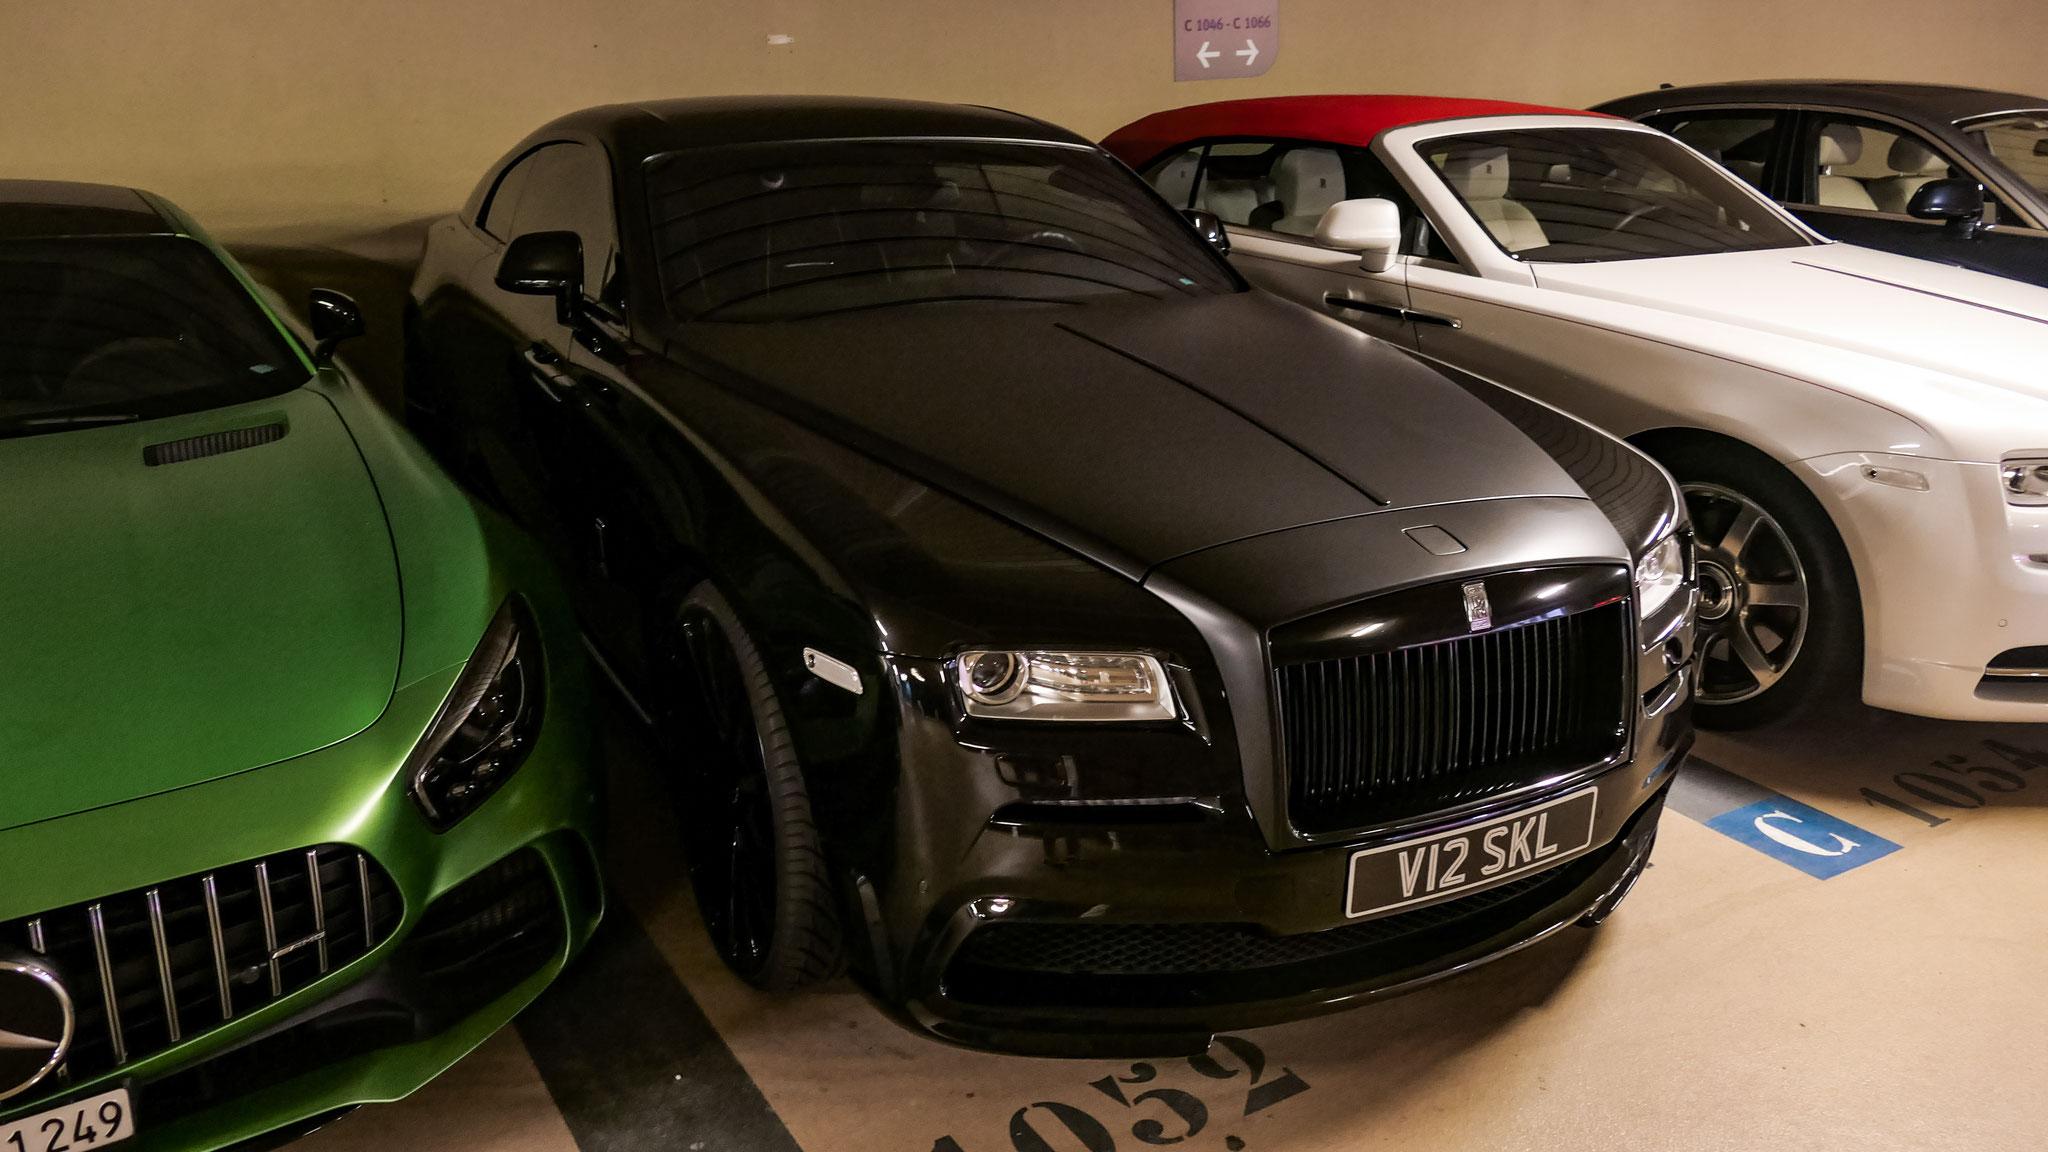 Rolls Royce Wraith - V12-SKL (GB)